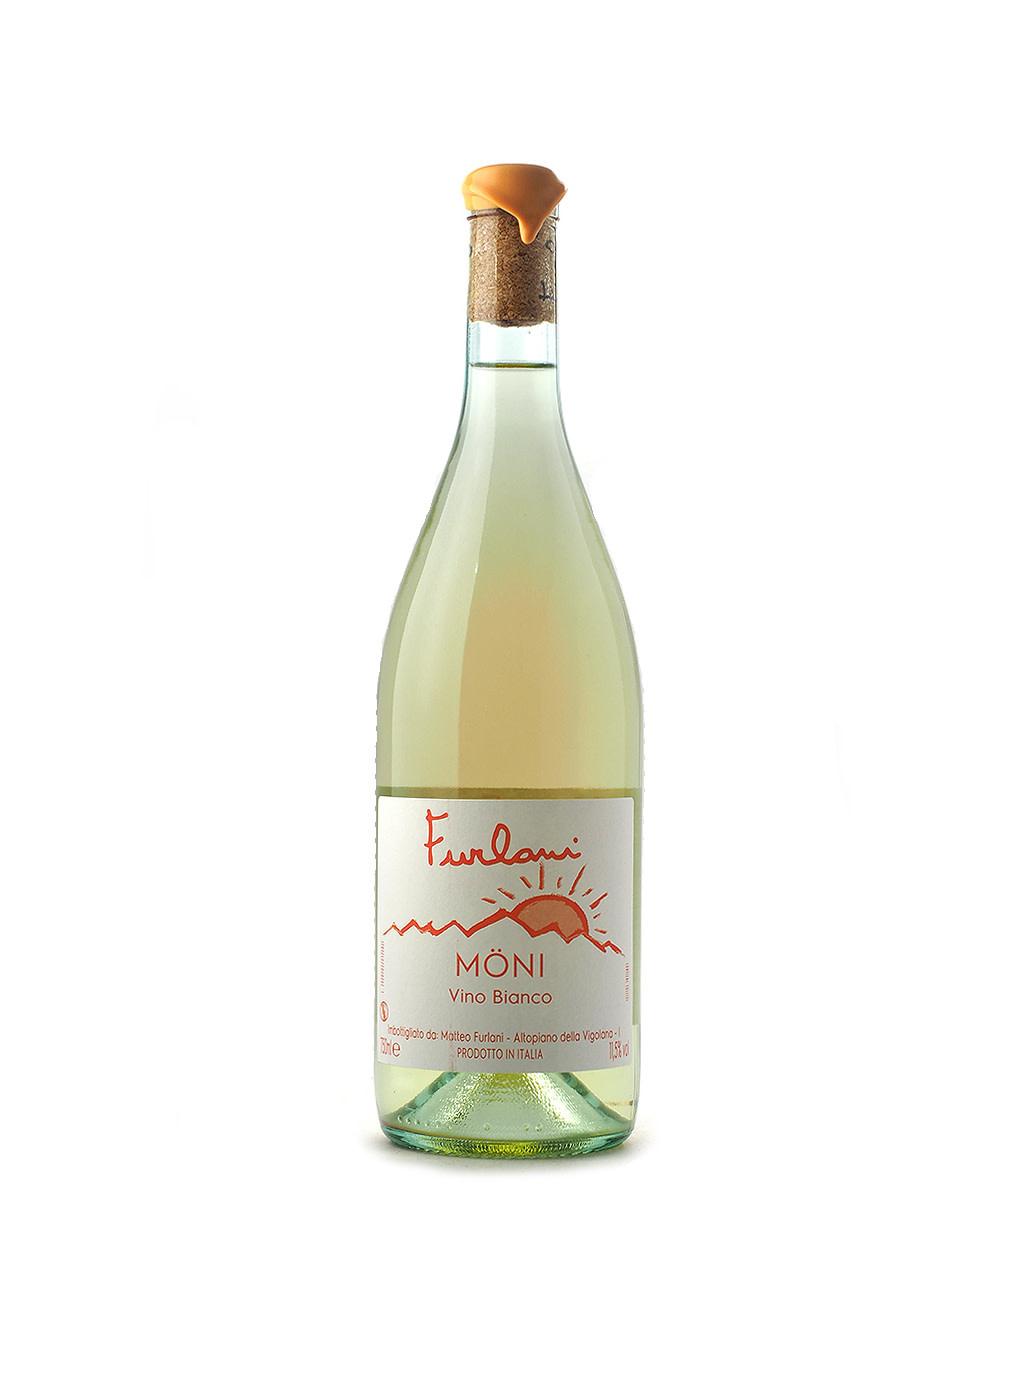 Cantina Furlani Moni Vino Bianco 2020